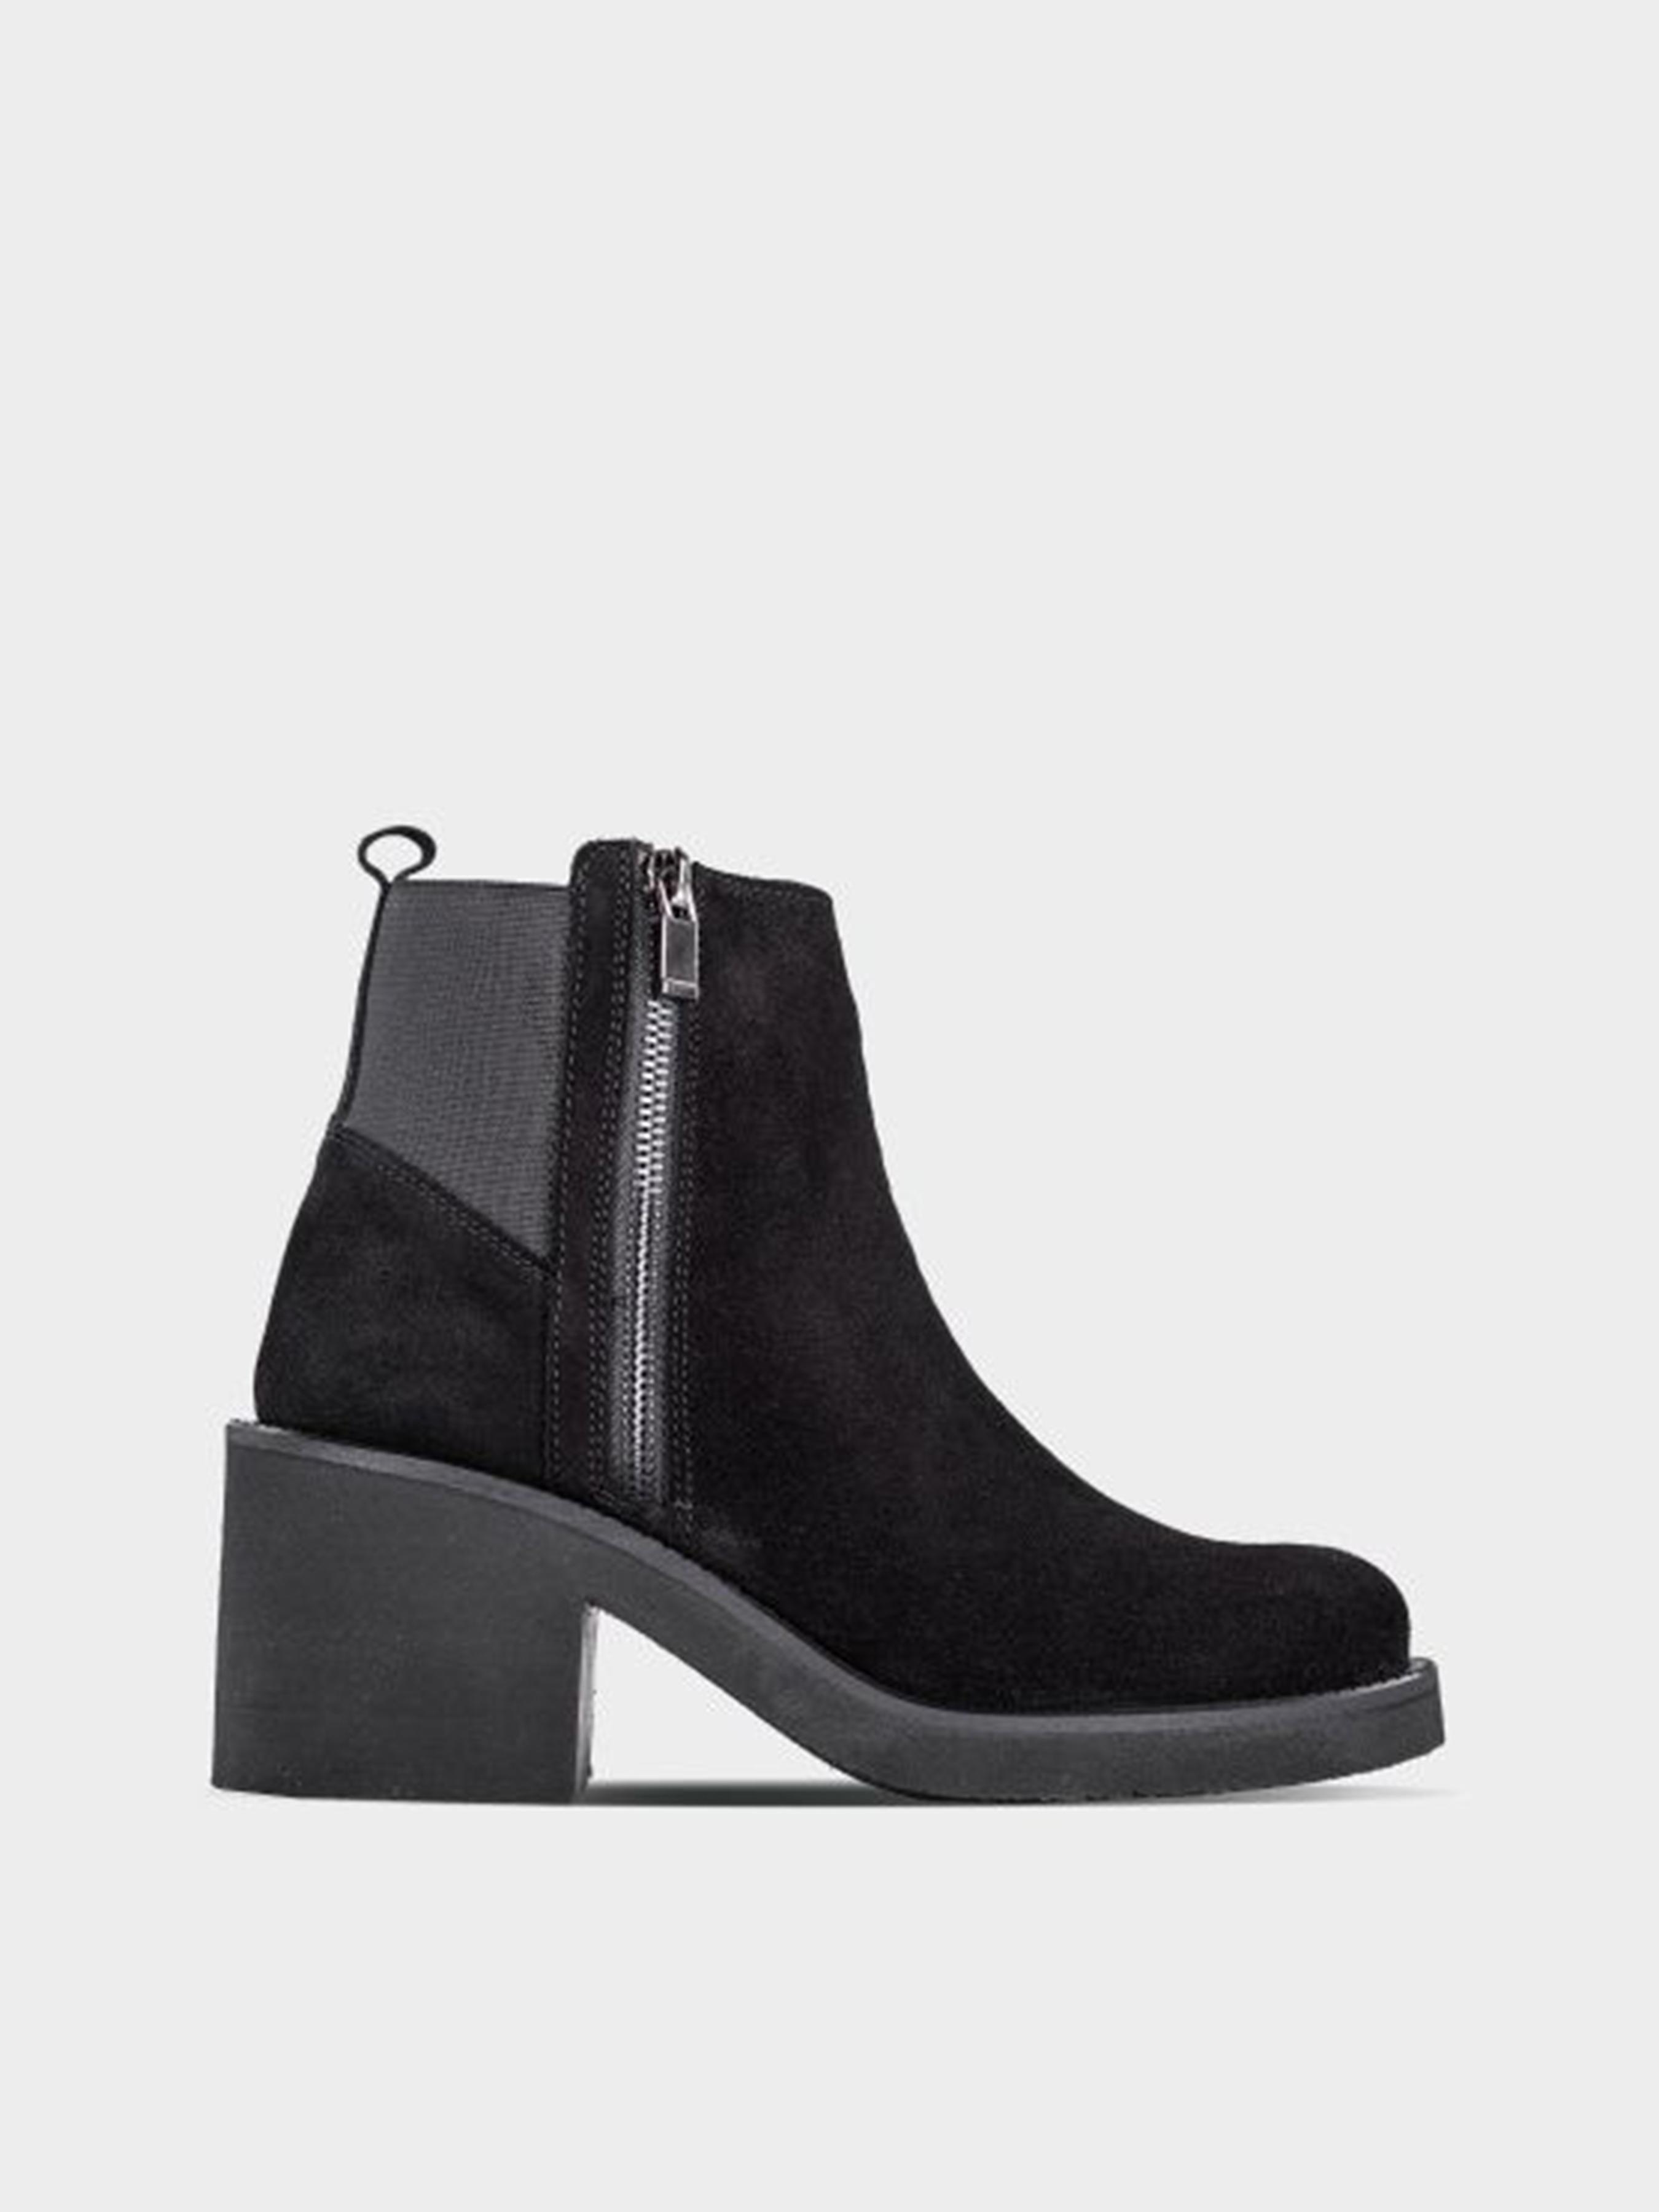 Ботинки для женщин Camalini MIU 0E7 размеры обуви, 2017